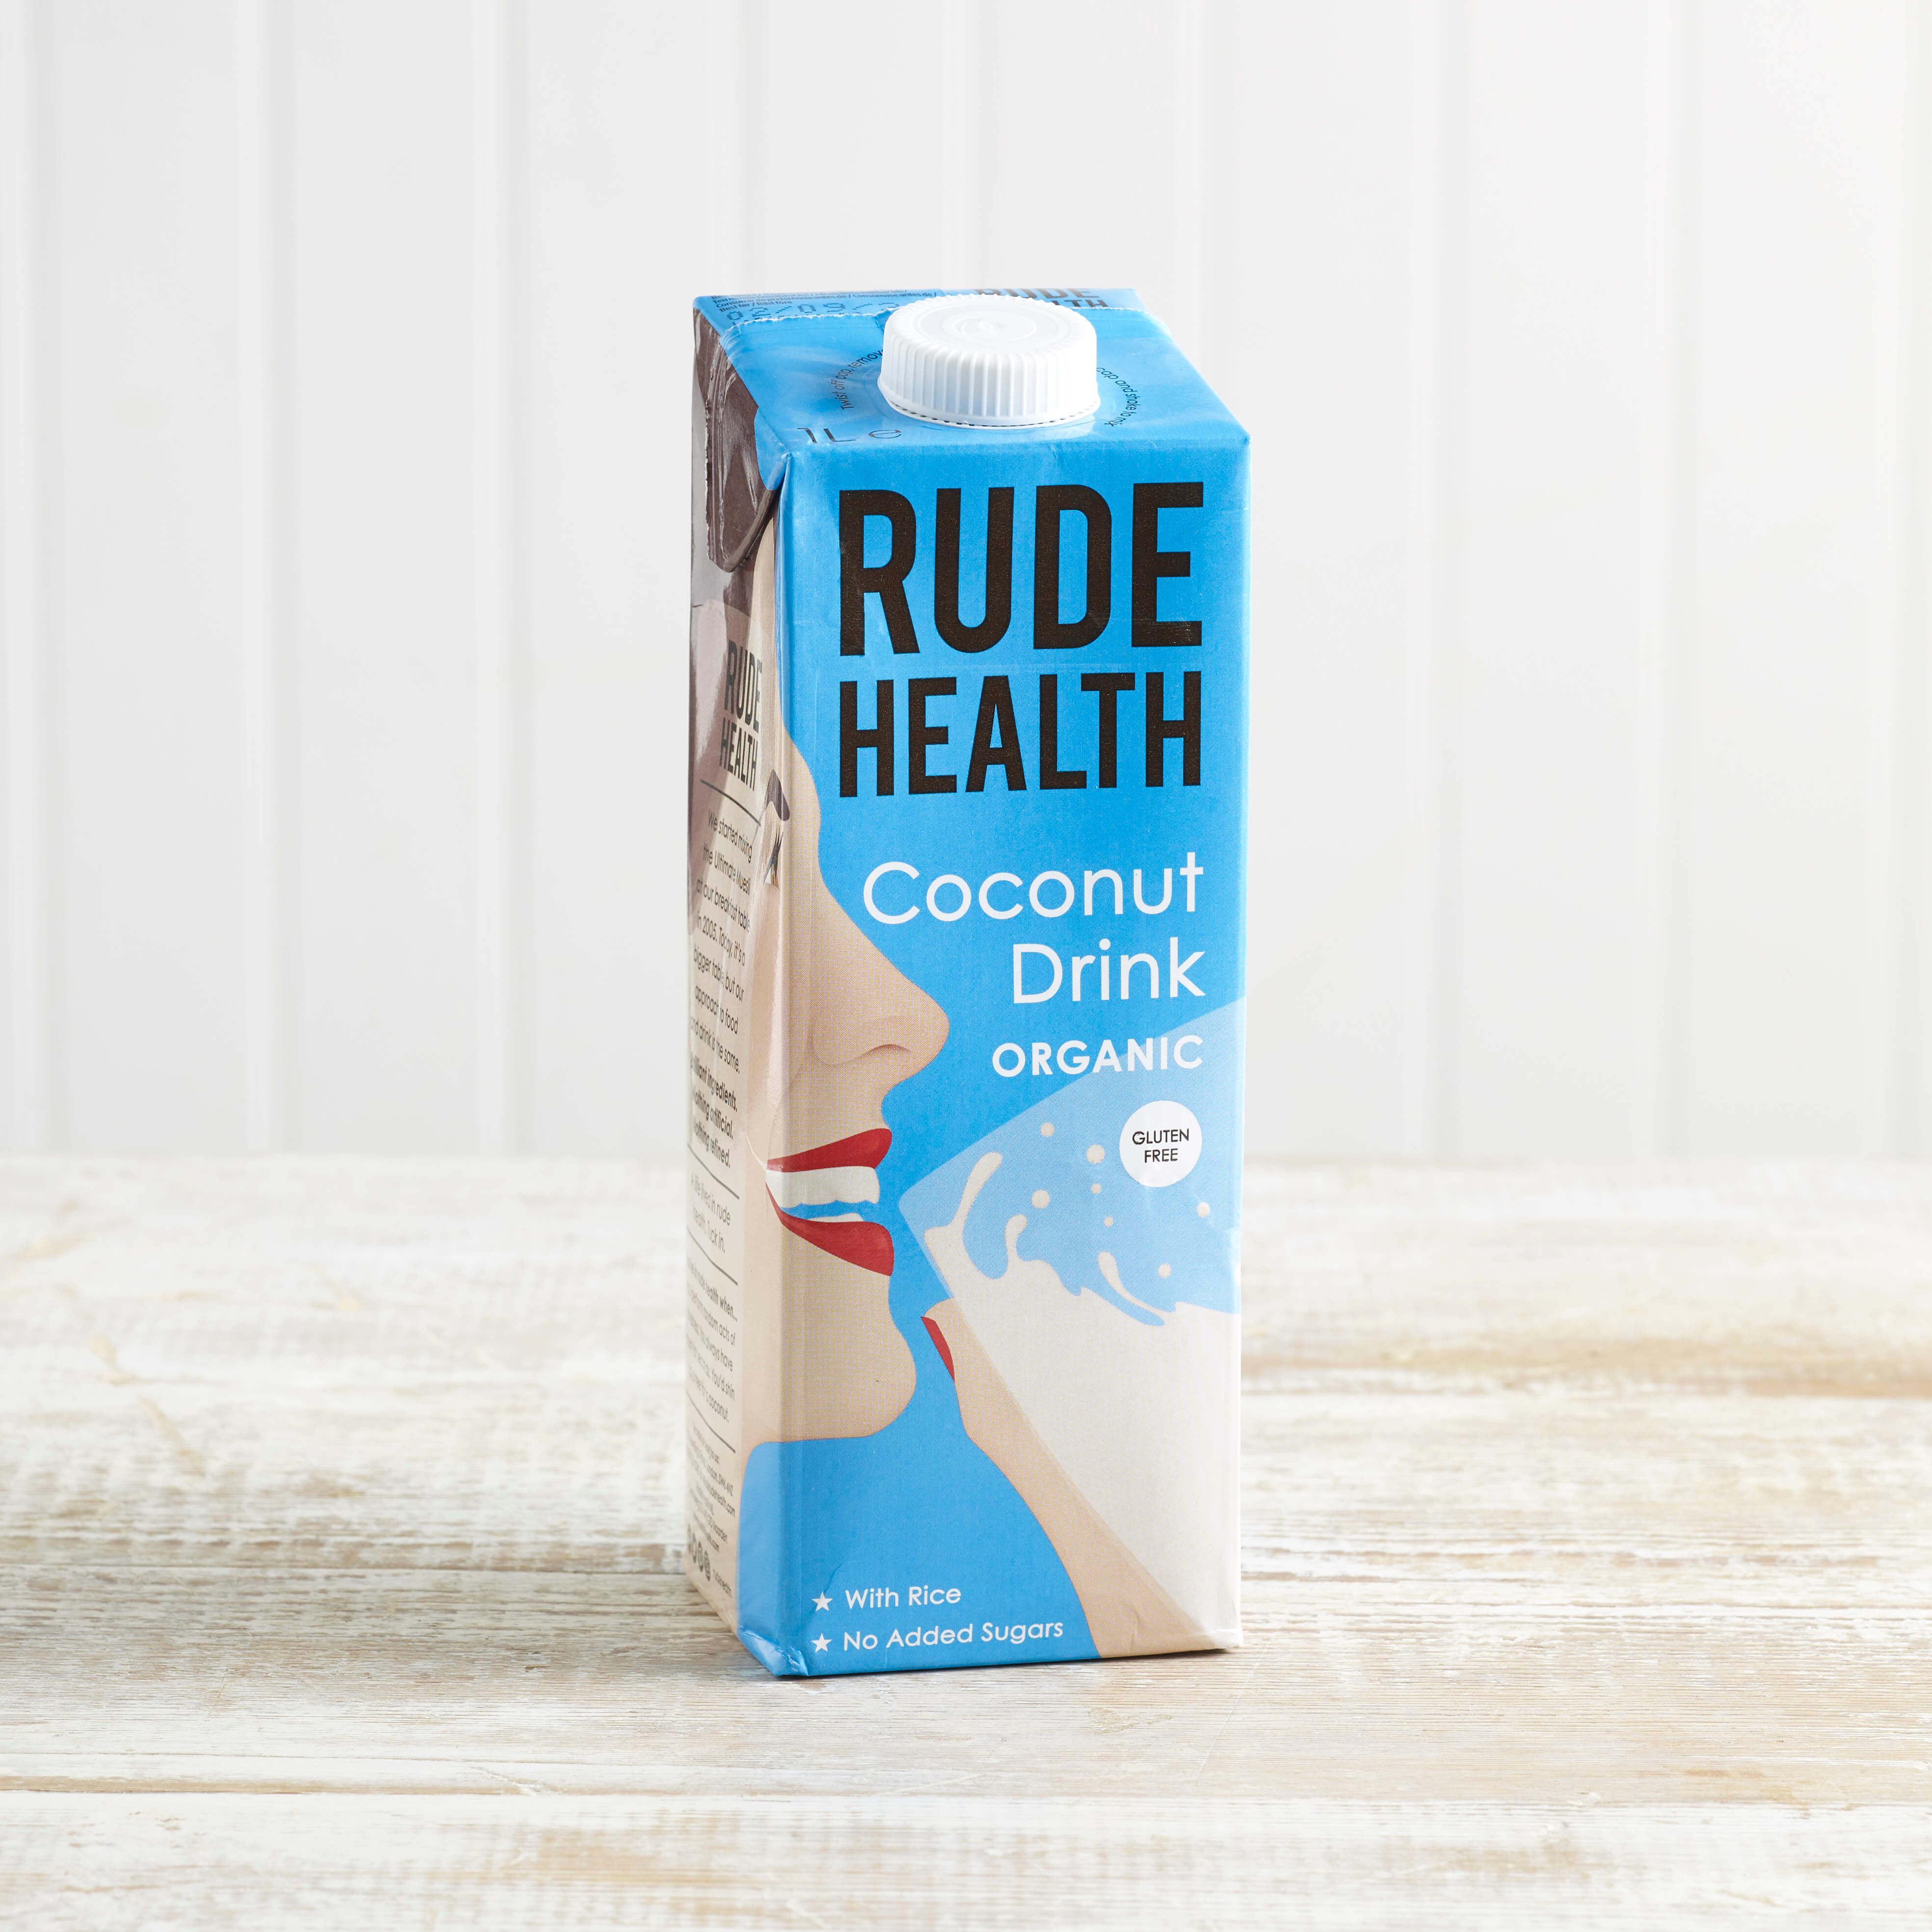 Rude Health Organic Coconut Drink, 1L